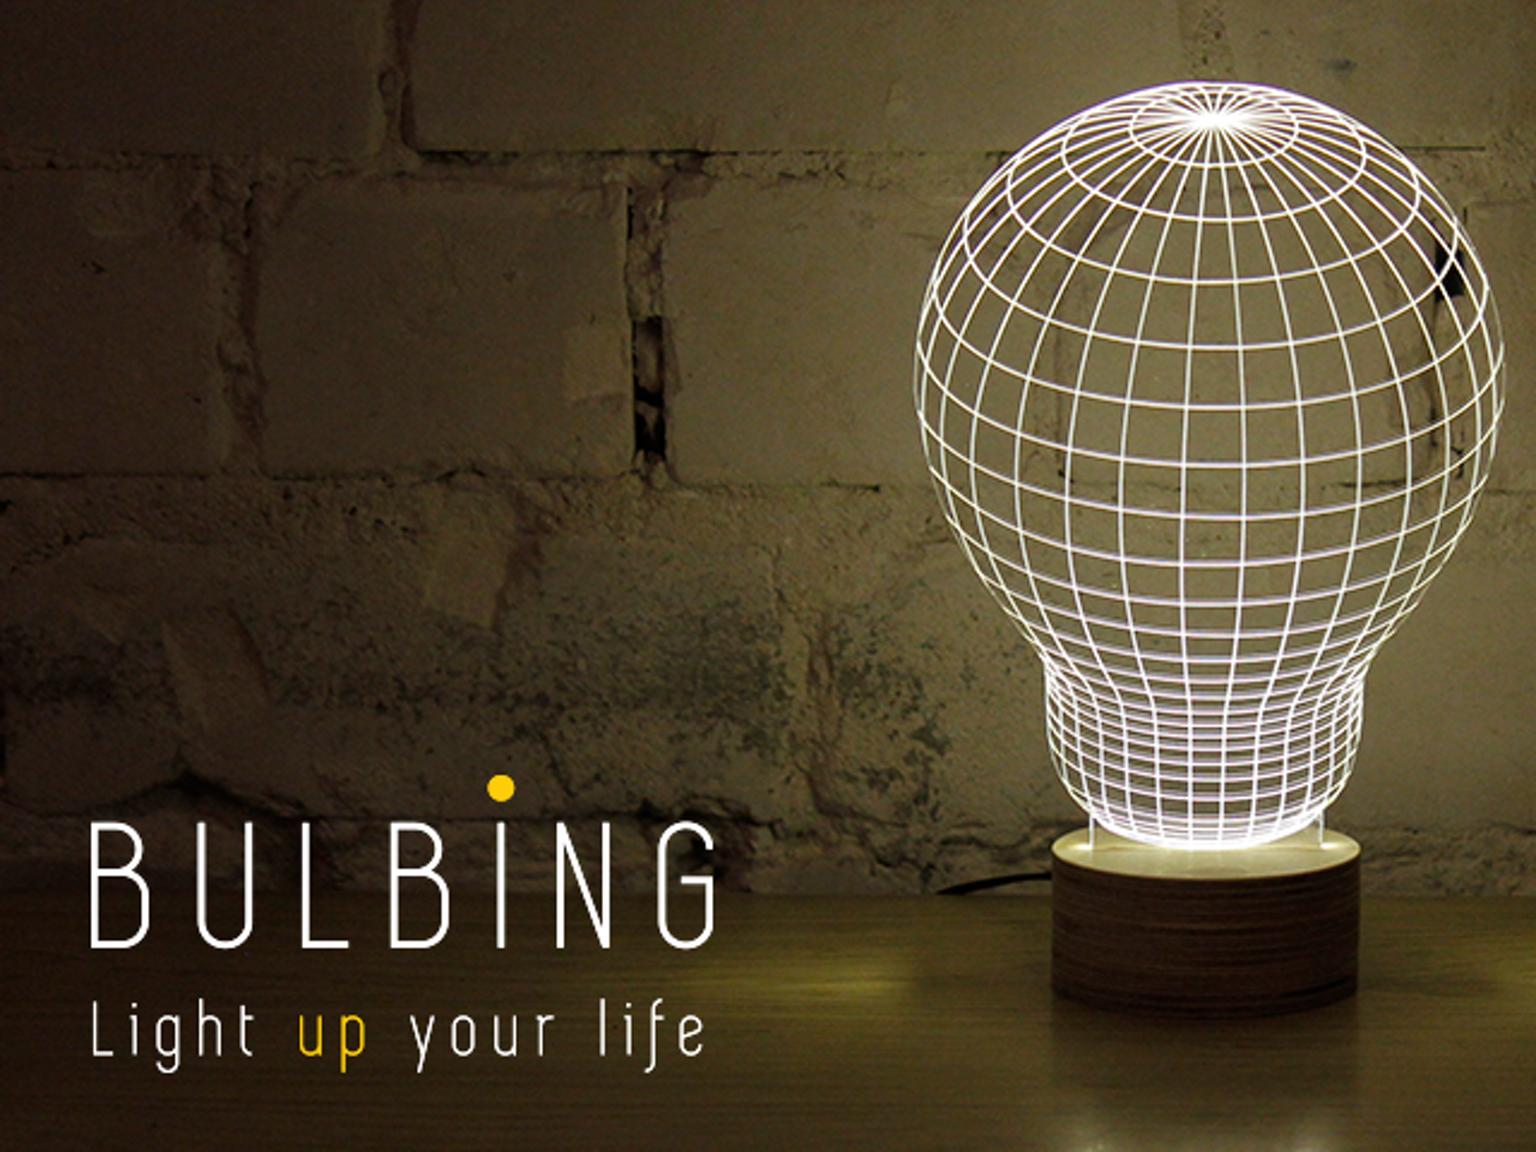 Led night light kickstarter - As Technology